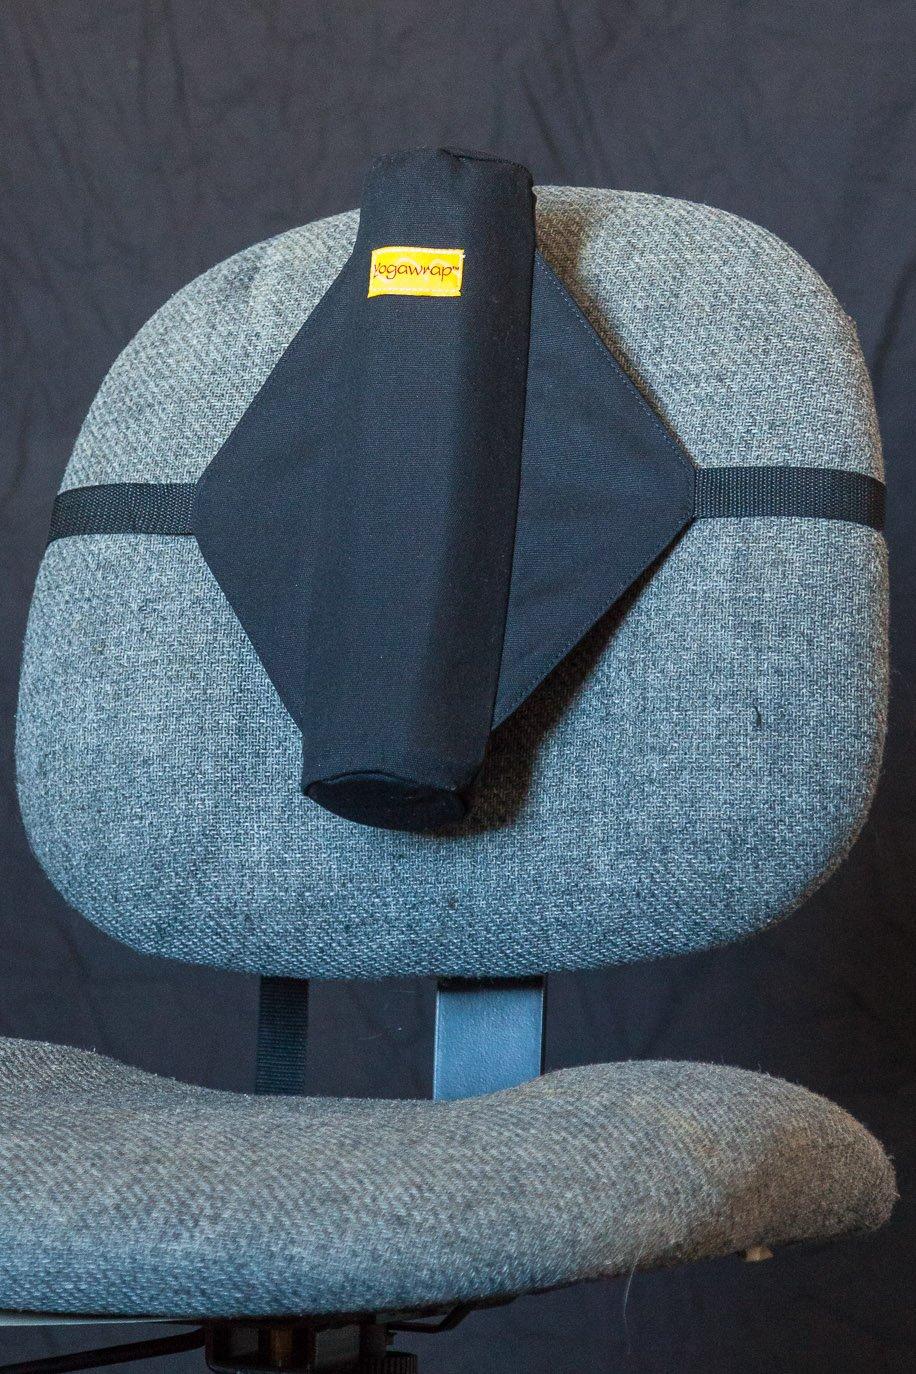 Yogawrap Spine Support (Black)